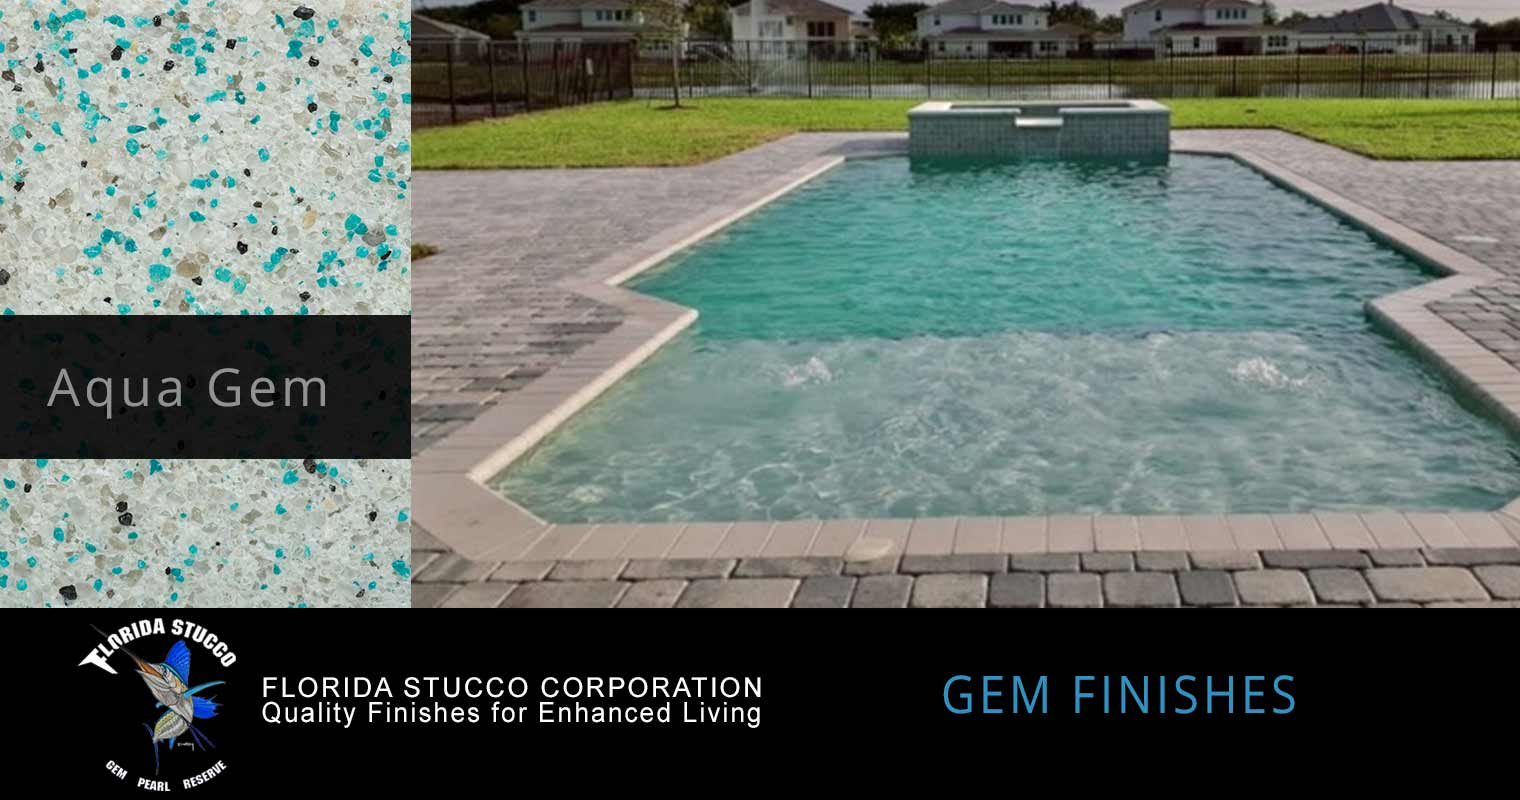 Florida Stucco - Aqua Gem Pool Plastering Finish Pool Sample 1